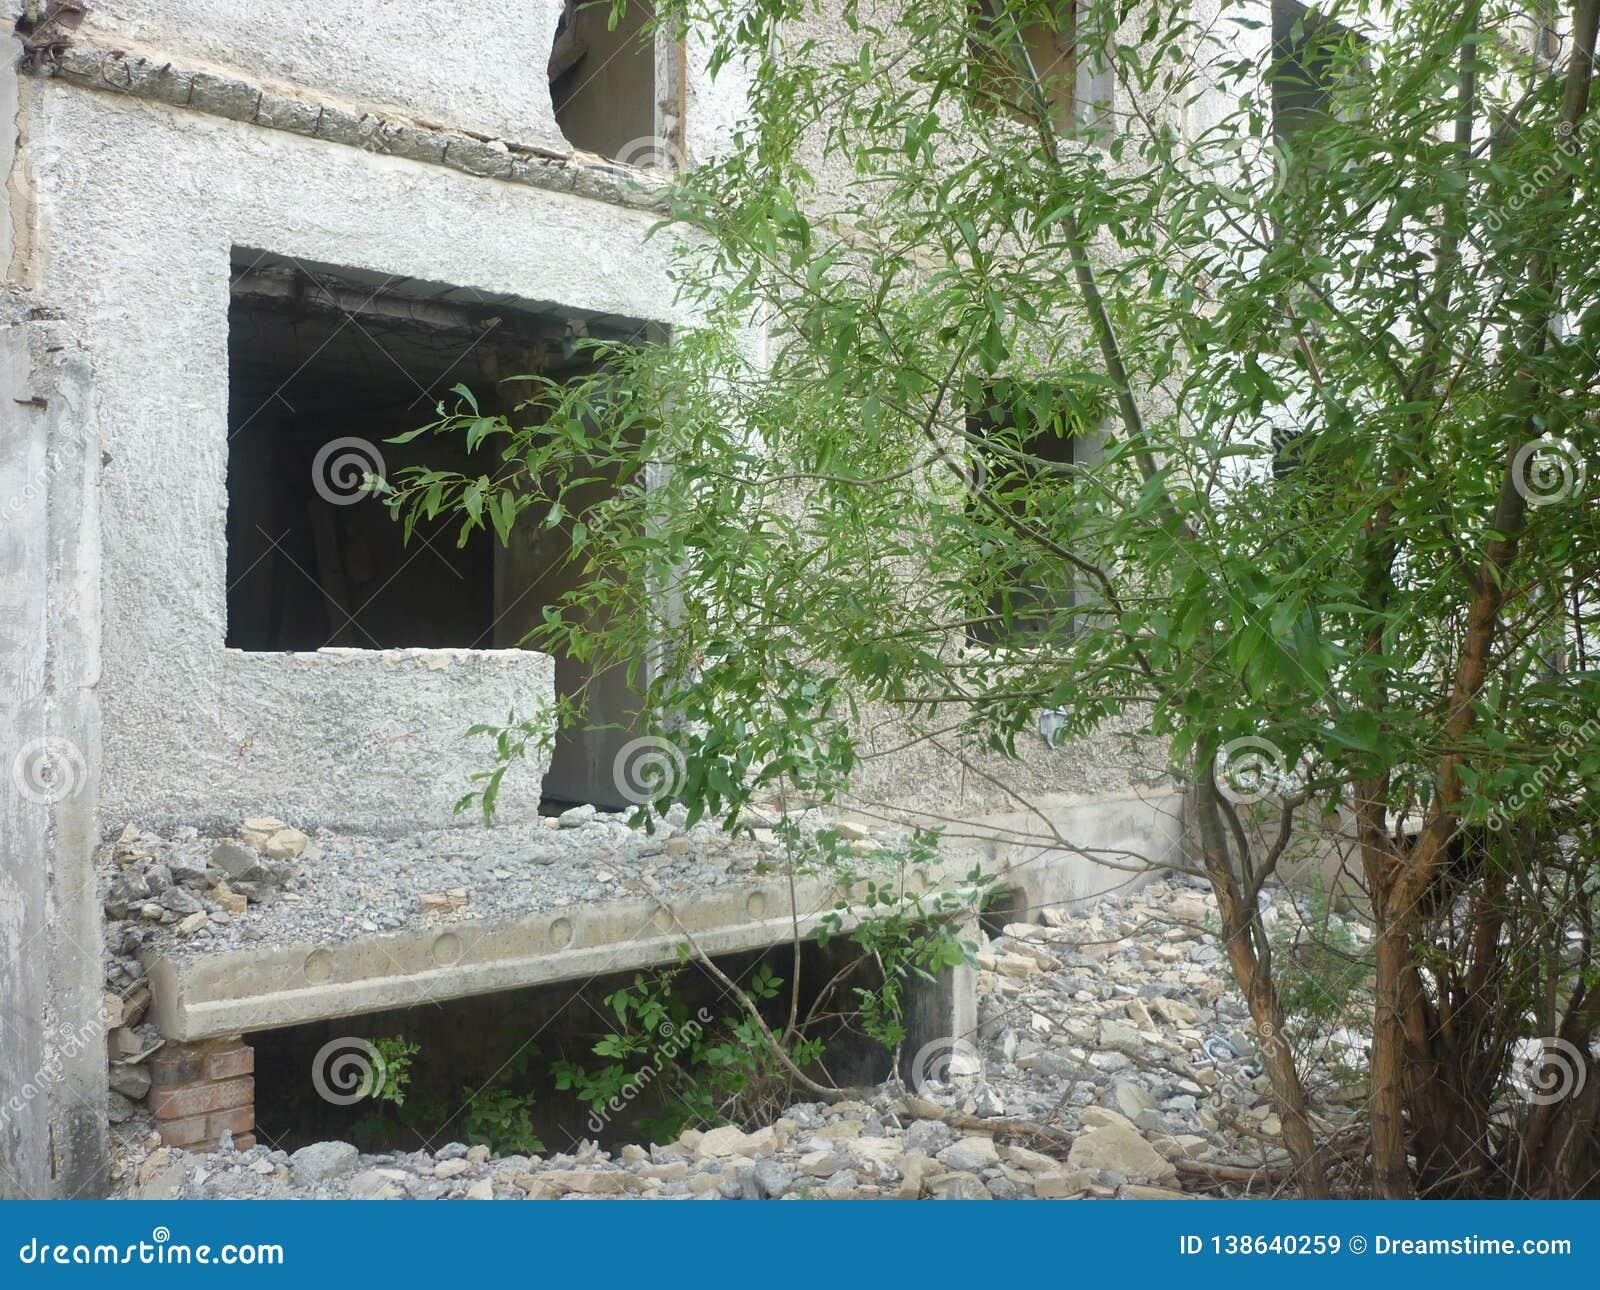 Das ruinierte Haus, das ich einmal herein lebte